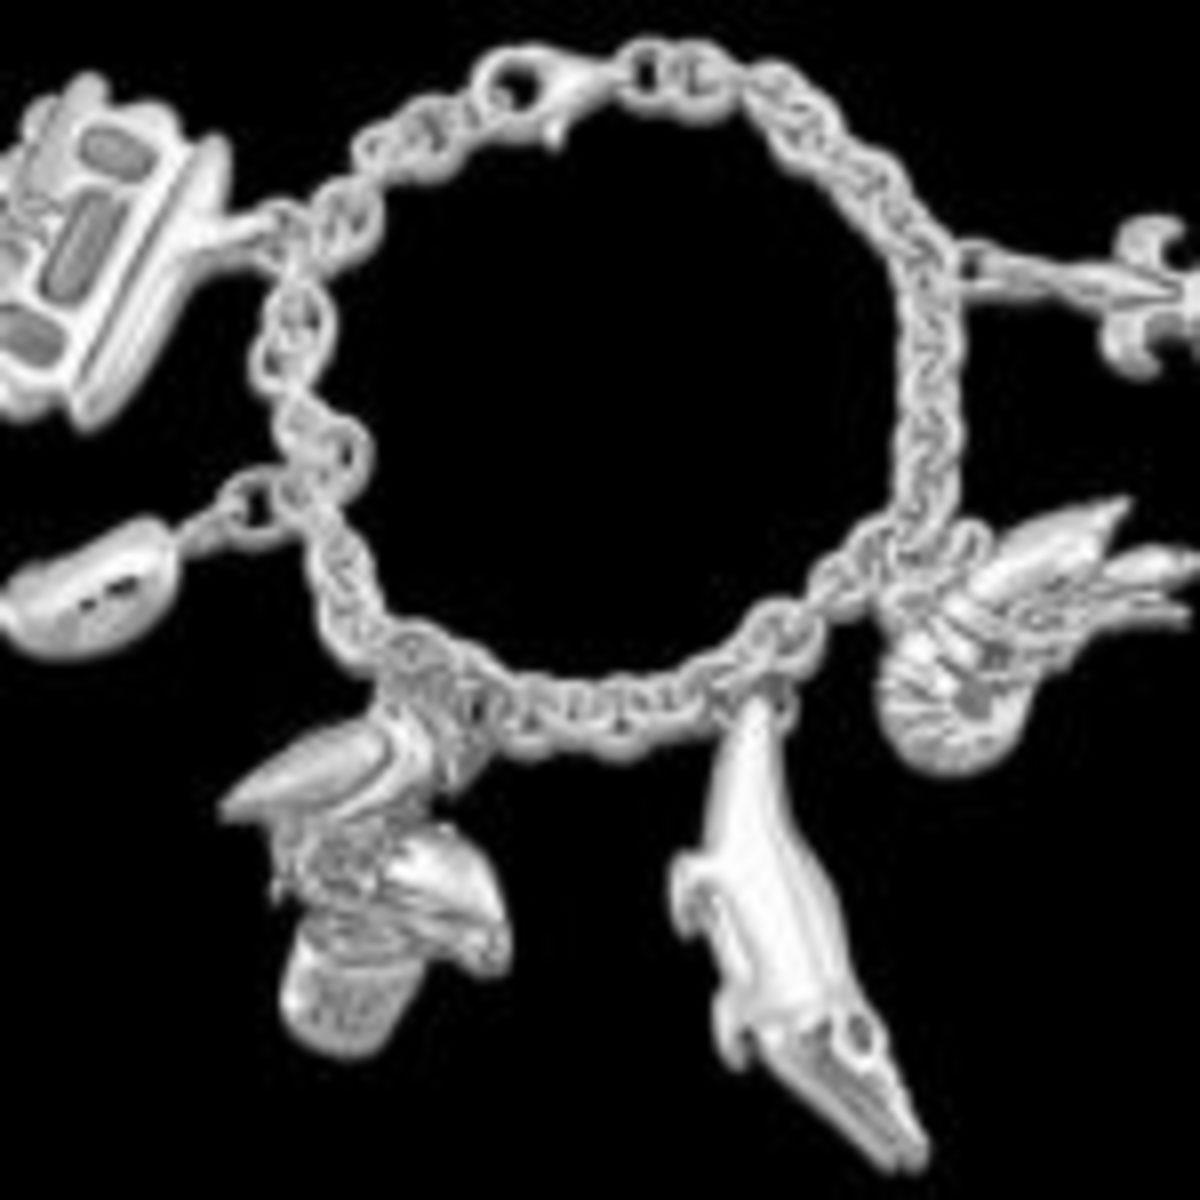 Mignon Faget New Orleans charm bracelet, sterling silver, available at https://www.mignonfaget.com/shop/product/0836.html. Courtesy https://www.mignonfaget.com/